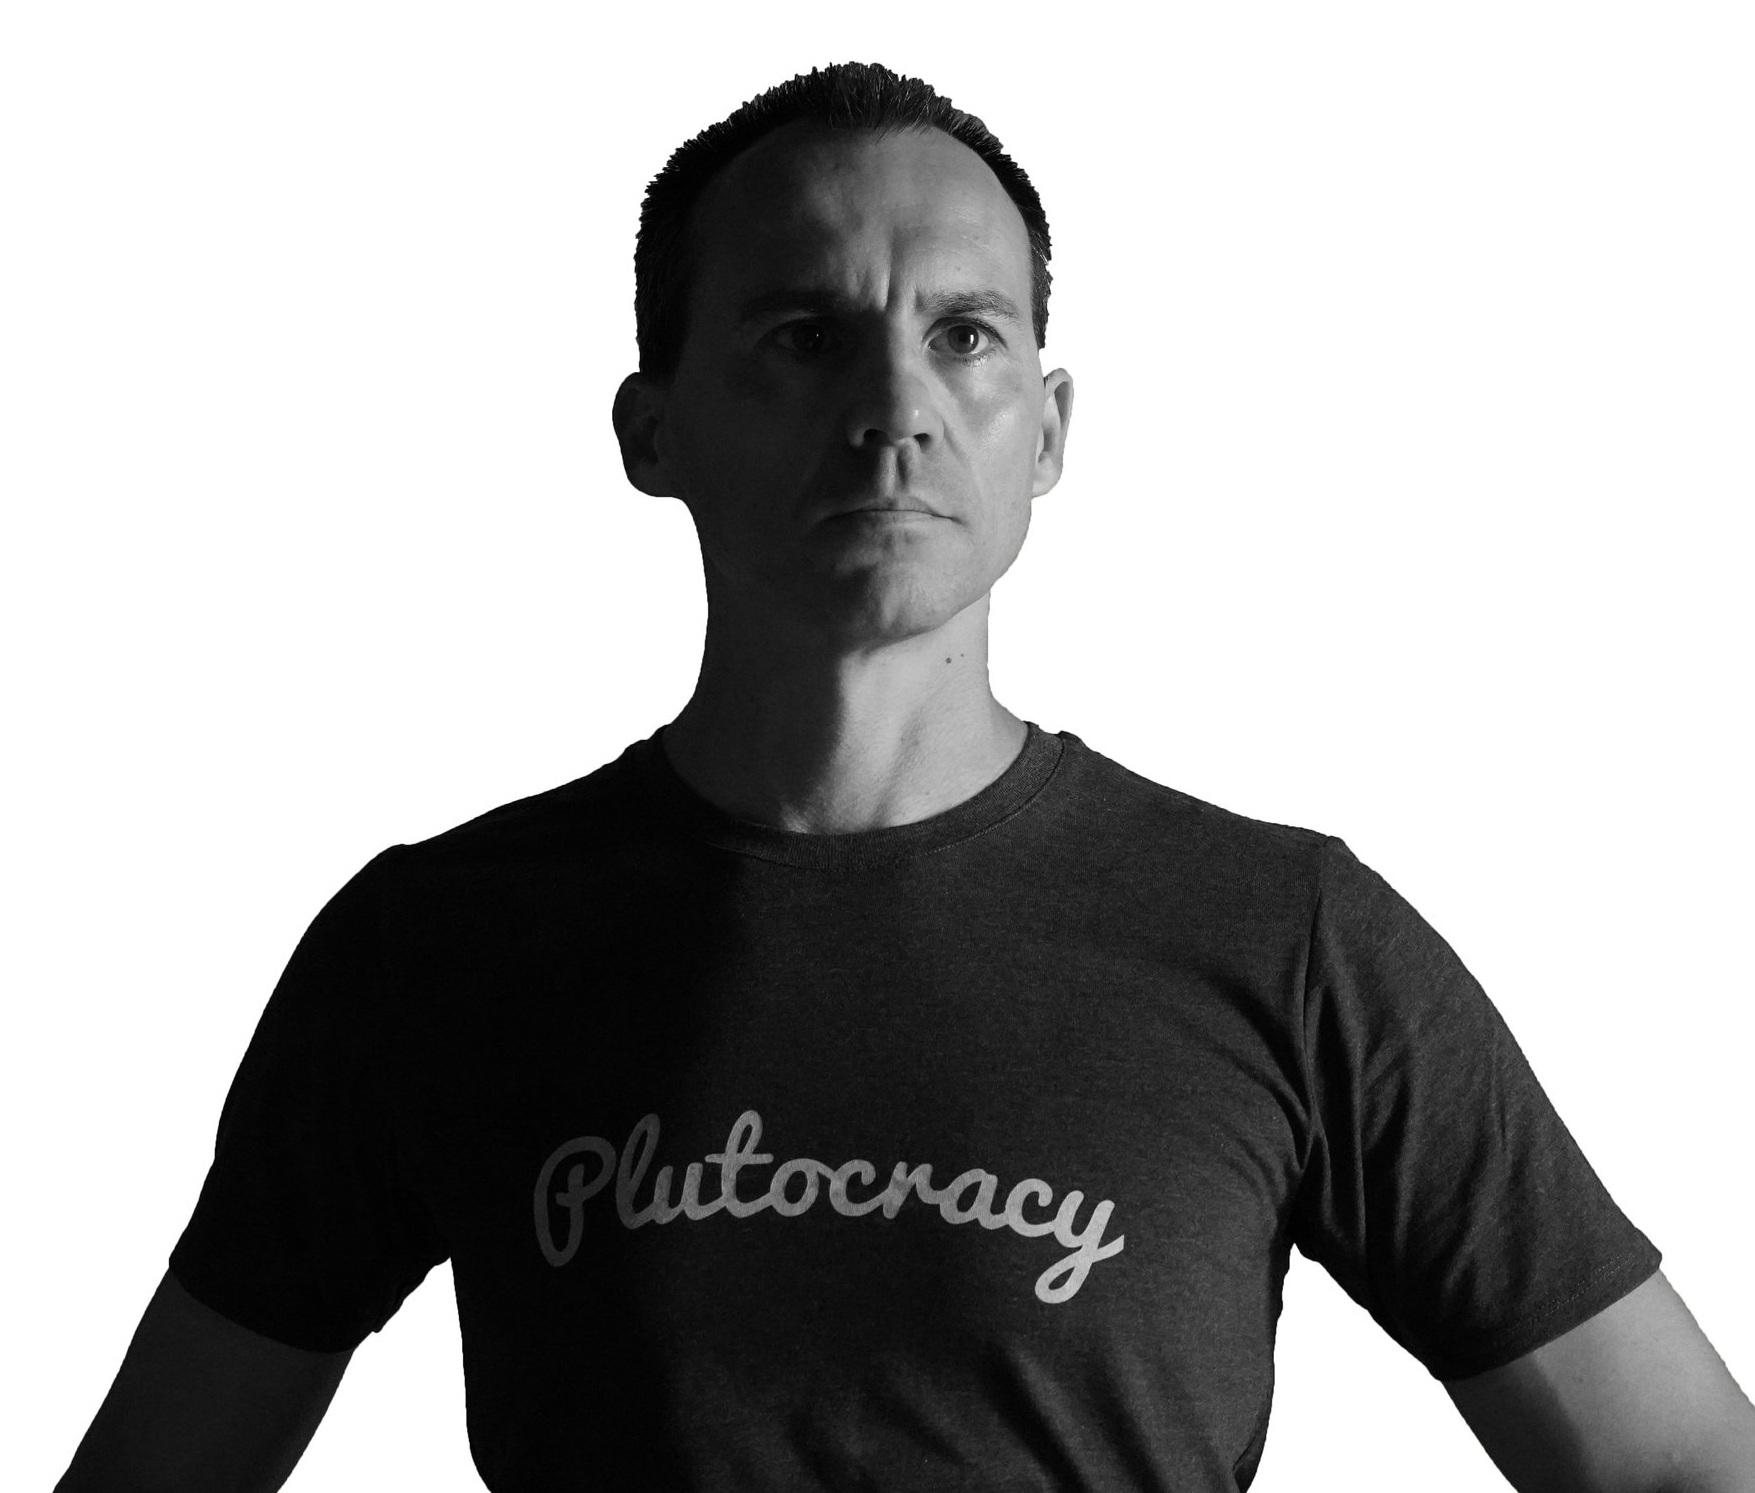 plutocracy+copy.jpg